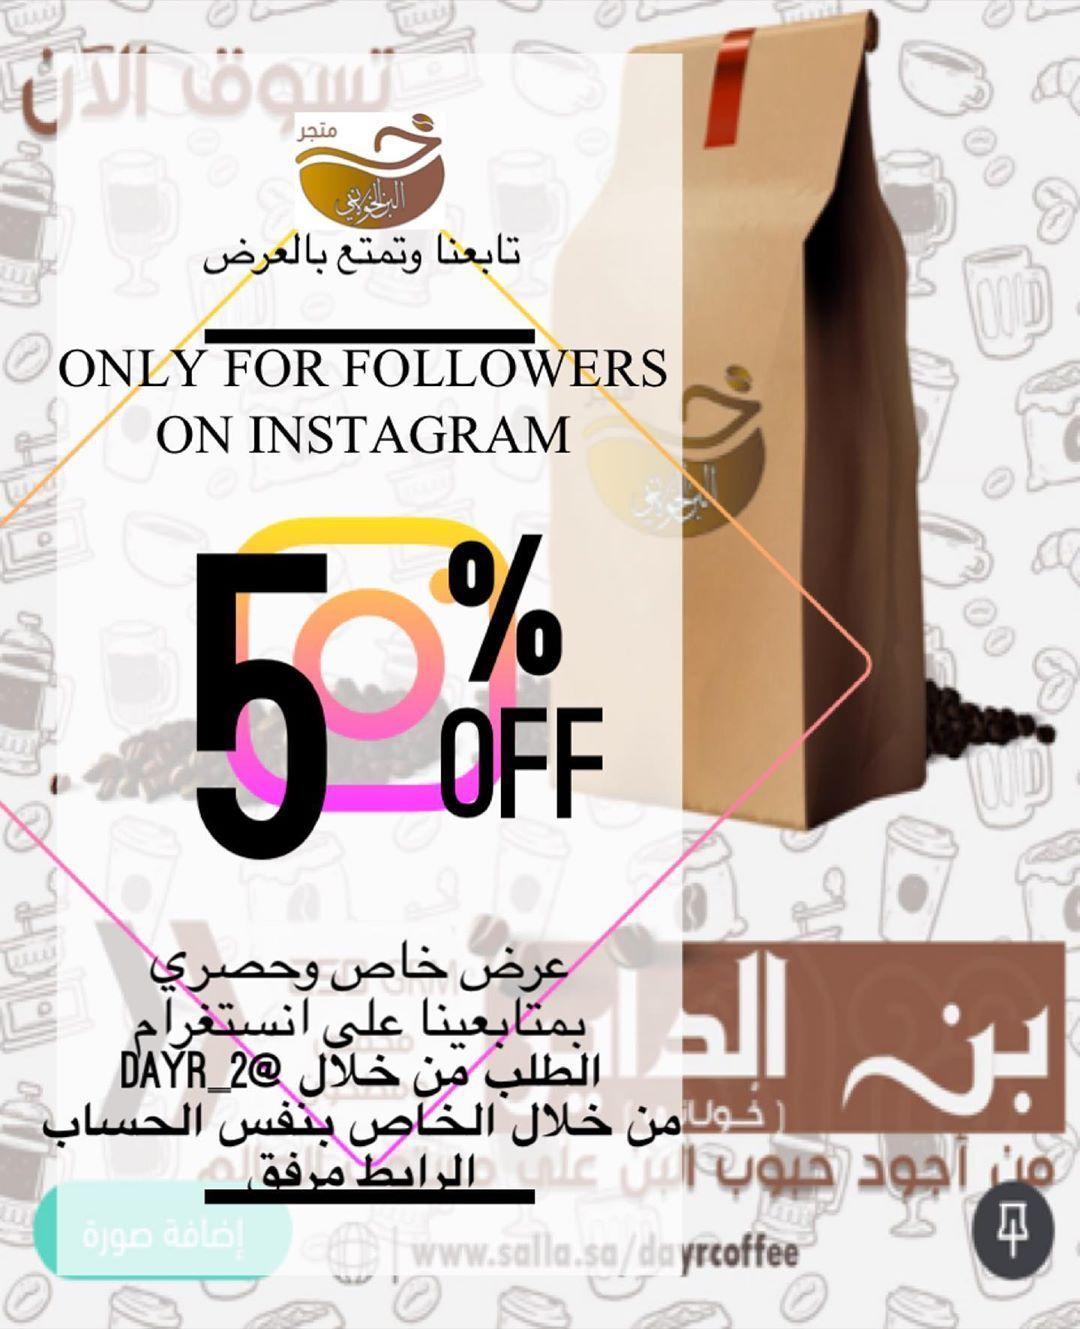 Instagram Post By متجر البن الخولاني Feb 14 2020 At 10 48pm Utc In 2020 Instagram Posts Instagram